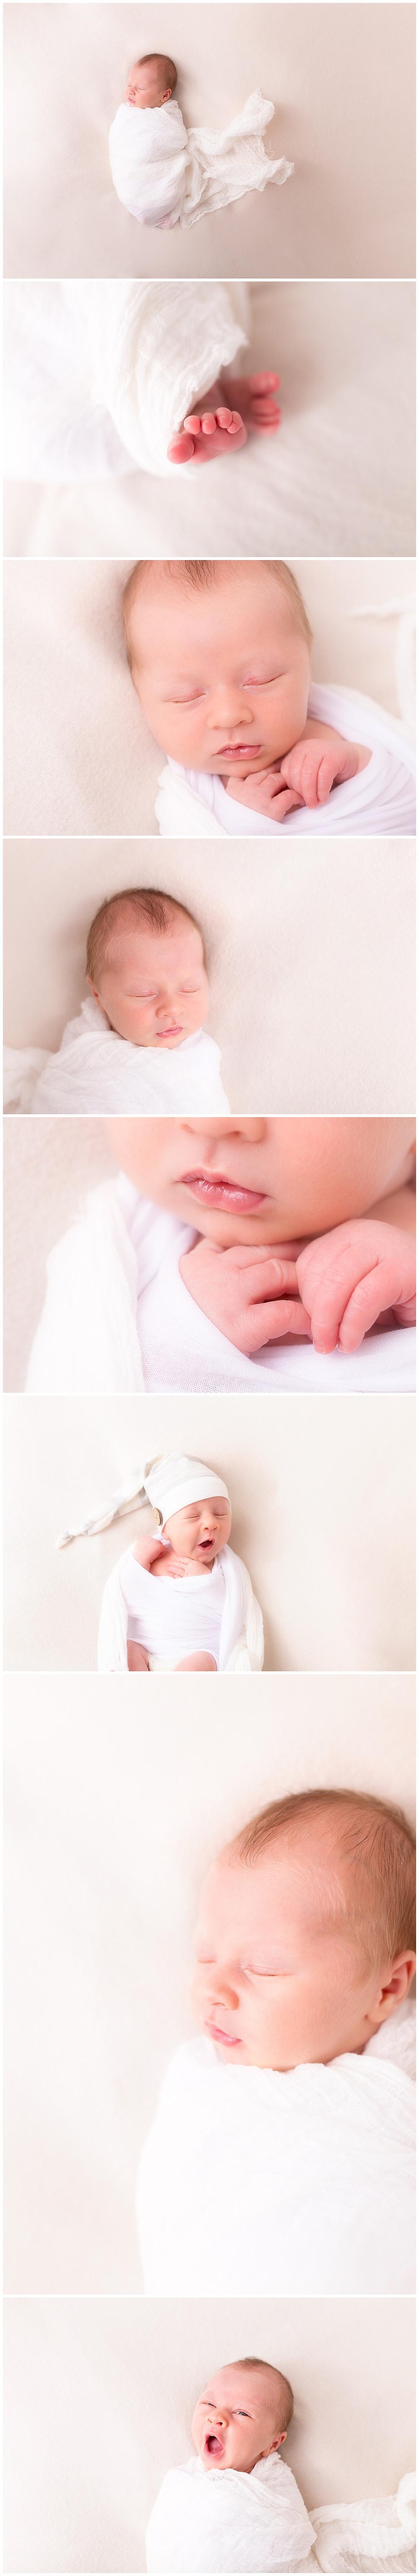 organic, natural, newborn posing